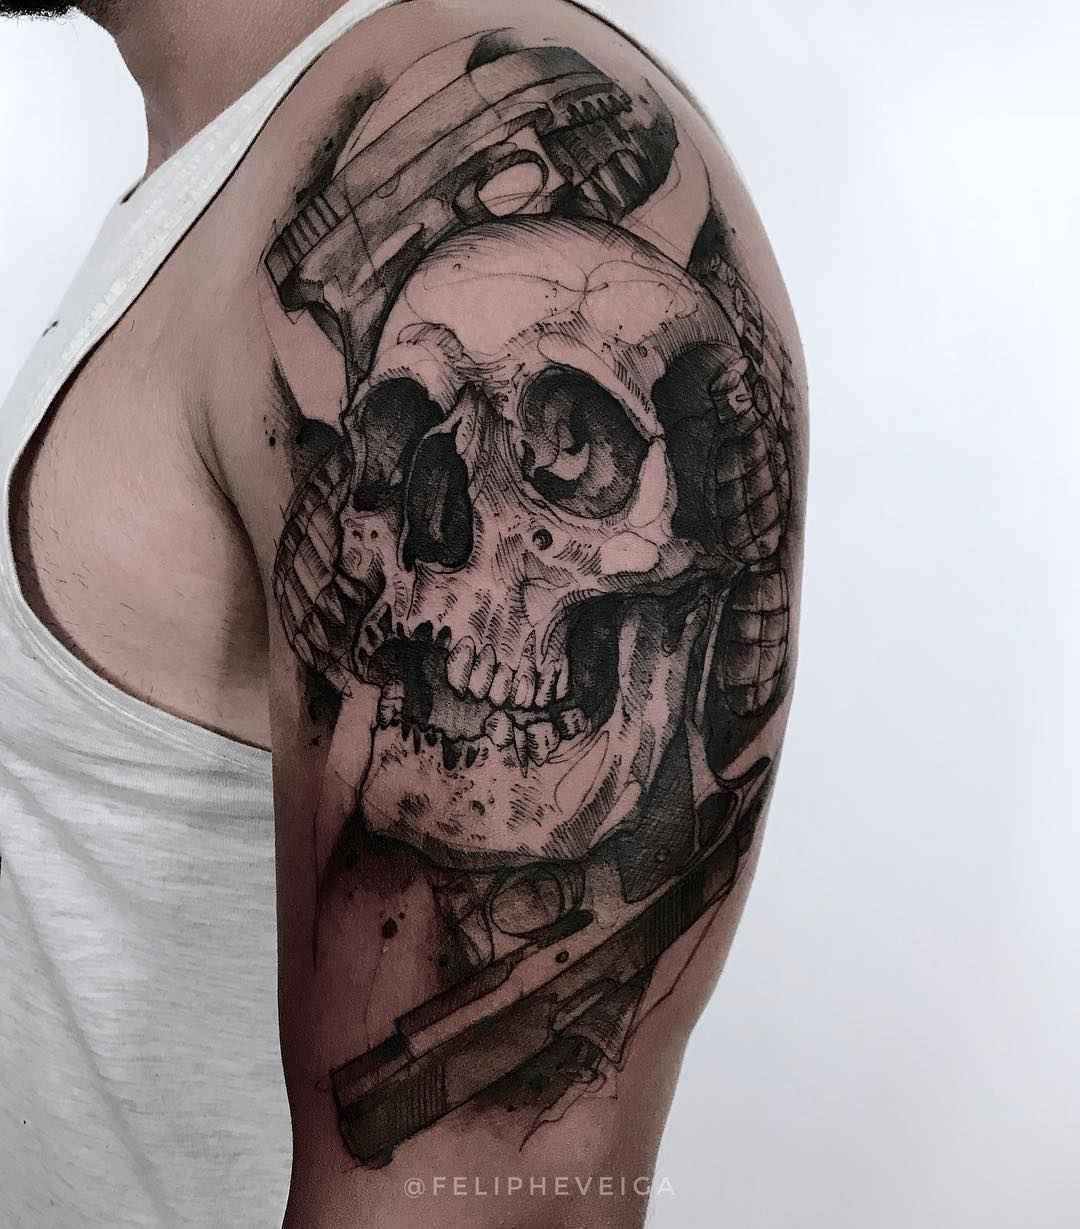 Tattoo artist Feliphe Veiga authors style black sketch tattoo, blackwork   Brasil   #inkppl #inkpplcom #inked #ink #inktattoo #tattoo #tatts #tattooartist #tattooing #tattoos #tattooist #art #artist #tattooed #inkedpeople #design #татуировка #тату #sketchwork #blacktattoo #sketchtattoo #designtattoo #sketchtattooing #lineworktattoo #linework #abstract #sketch